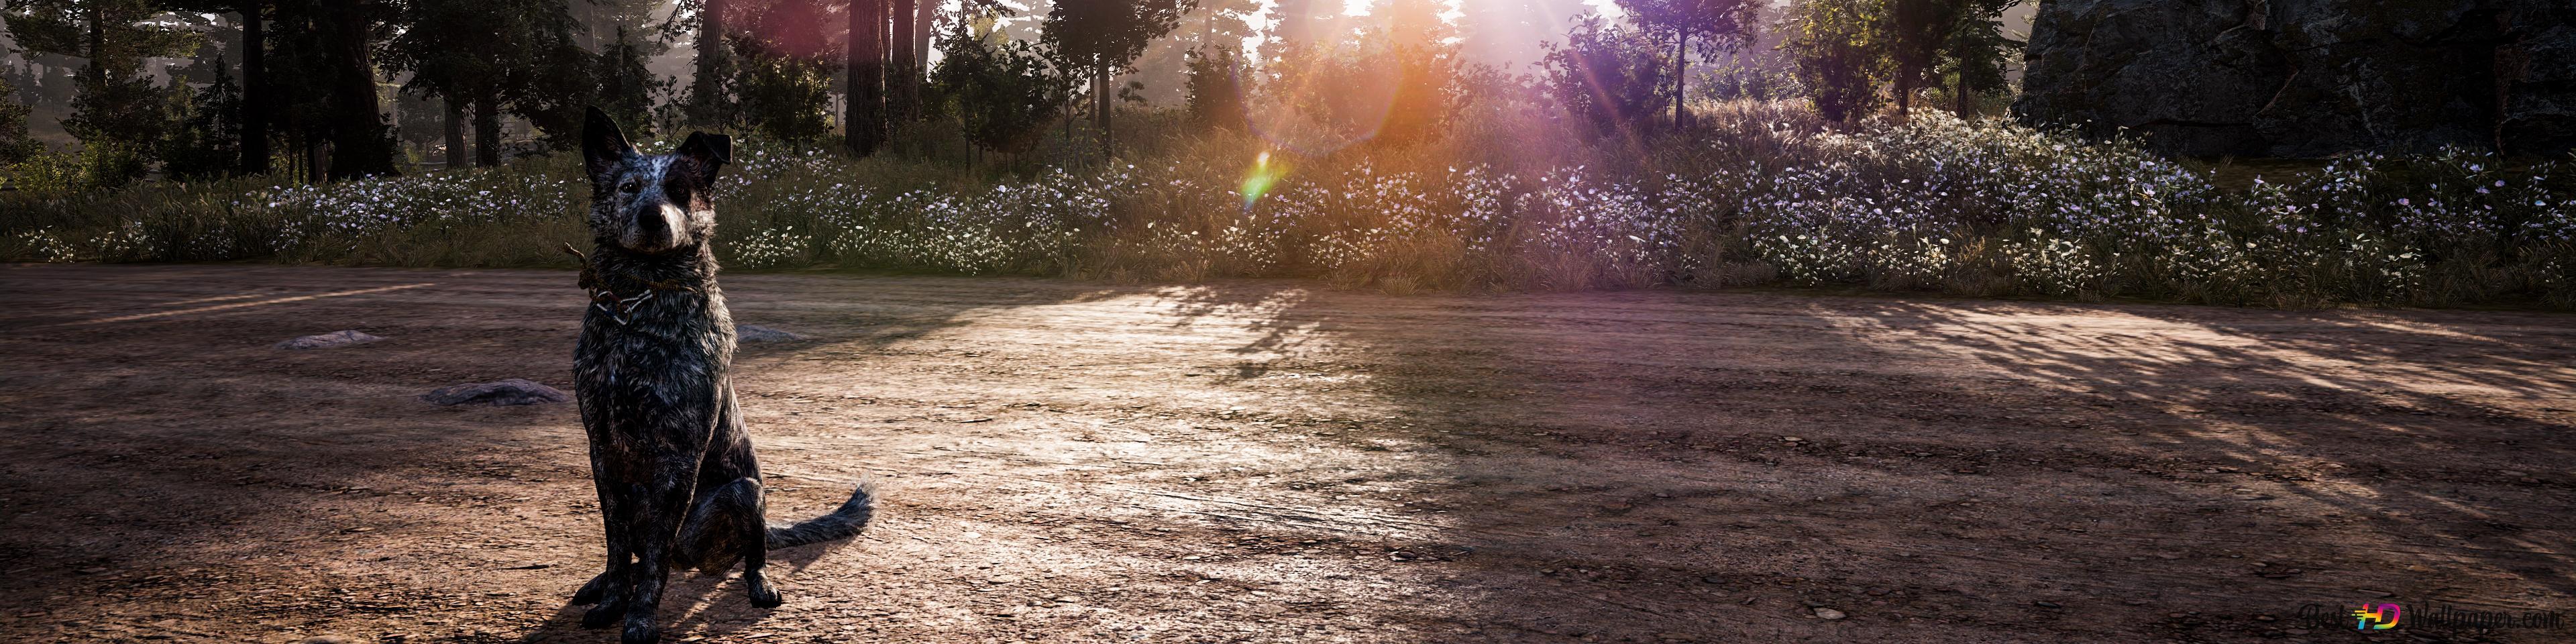 Far Cry 5: The Platters -A Loyal Friend HD wallpaper download